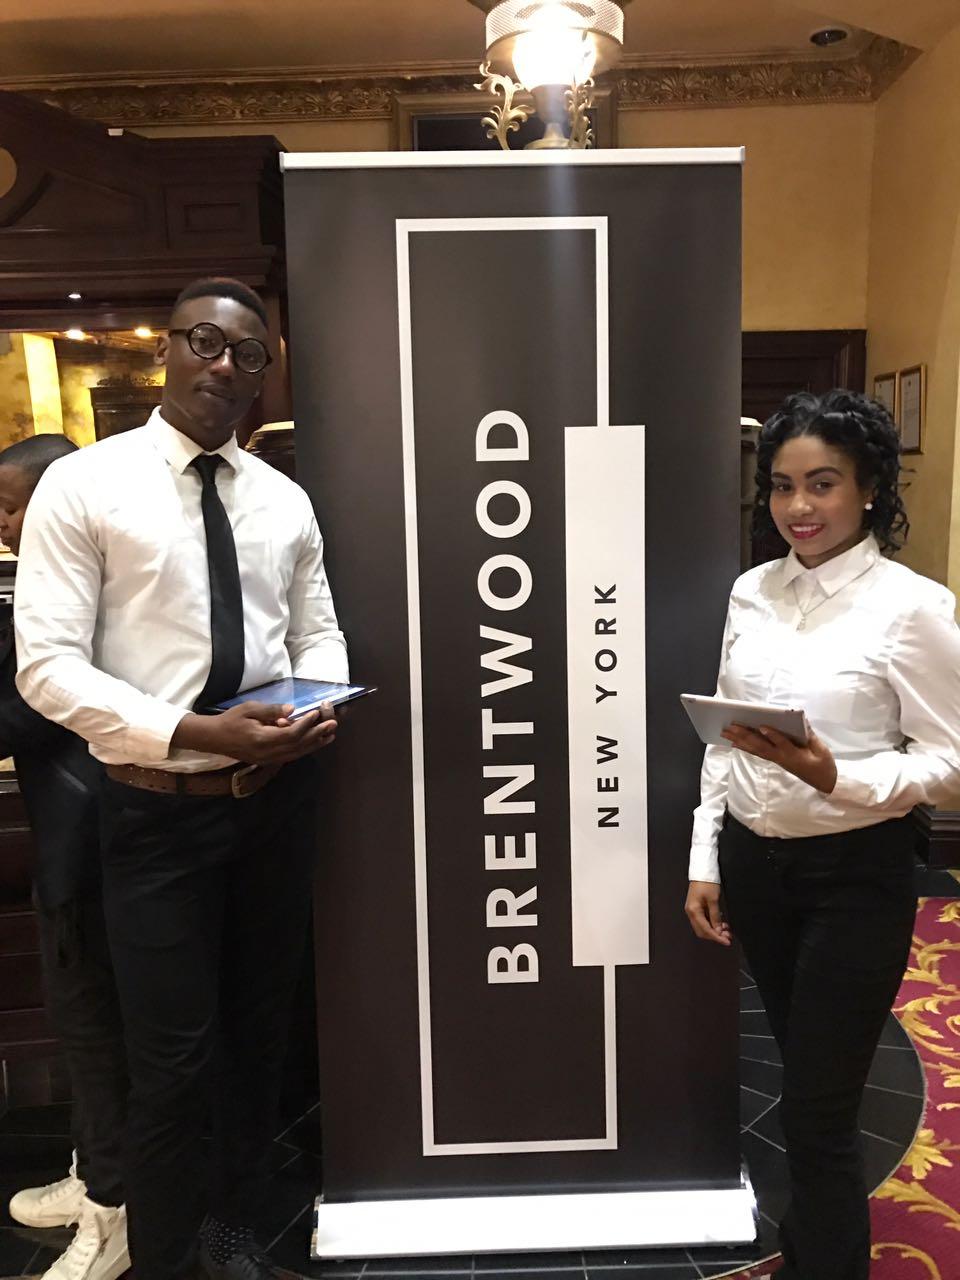 Megaworxx Brentwood Brand Activation